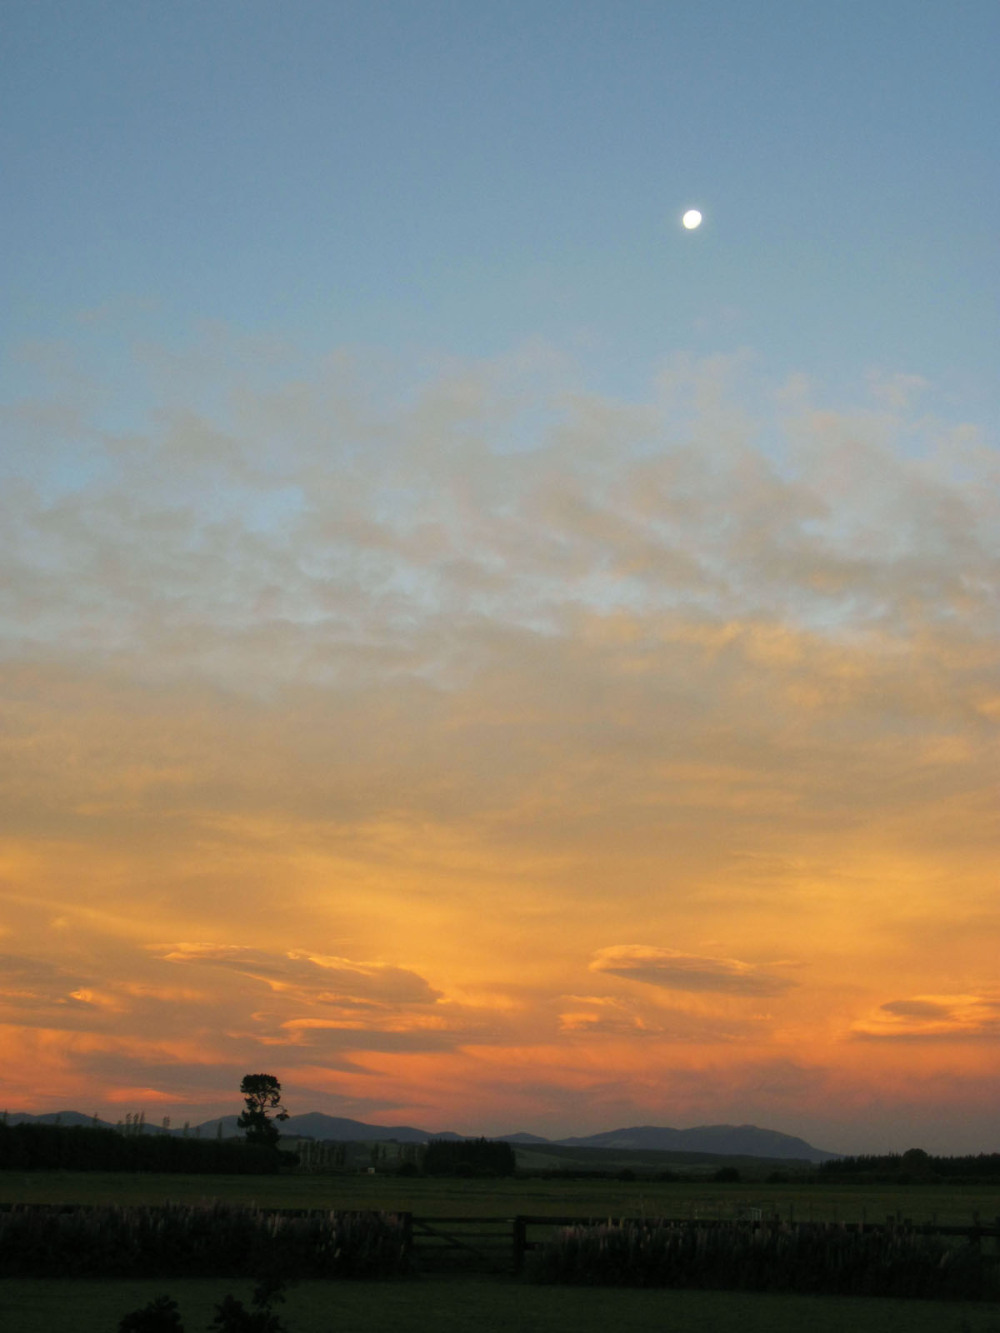 Sunset on the farm, Canterbury, New Zealand